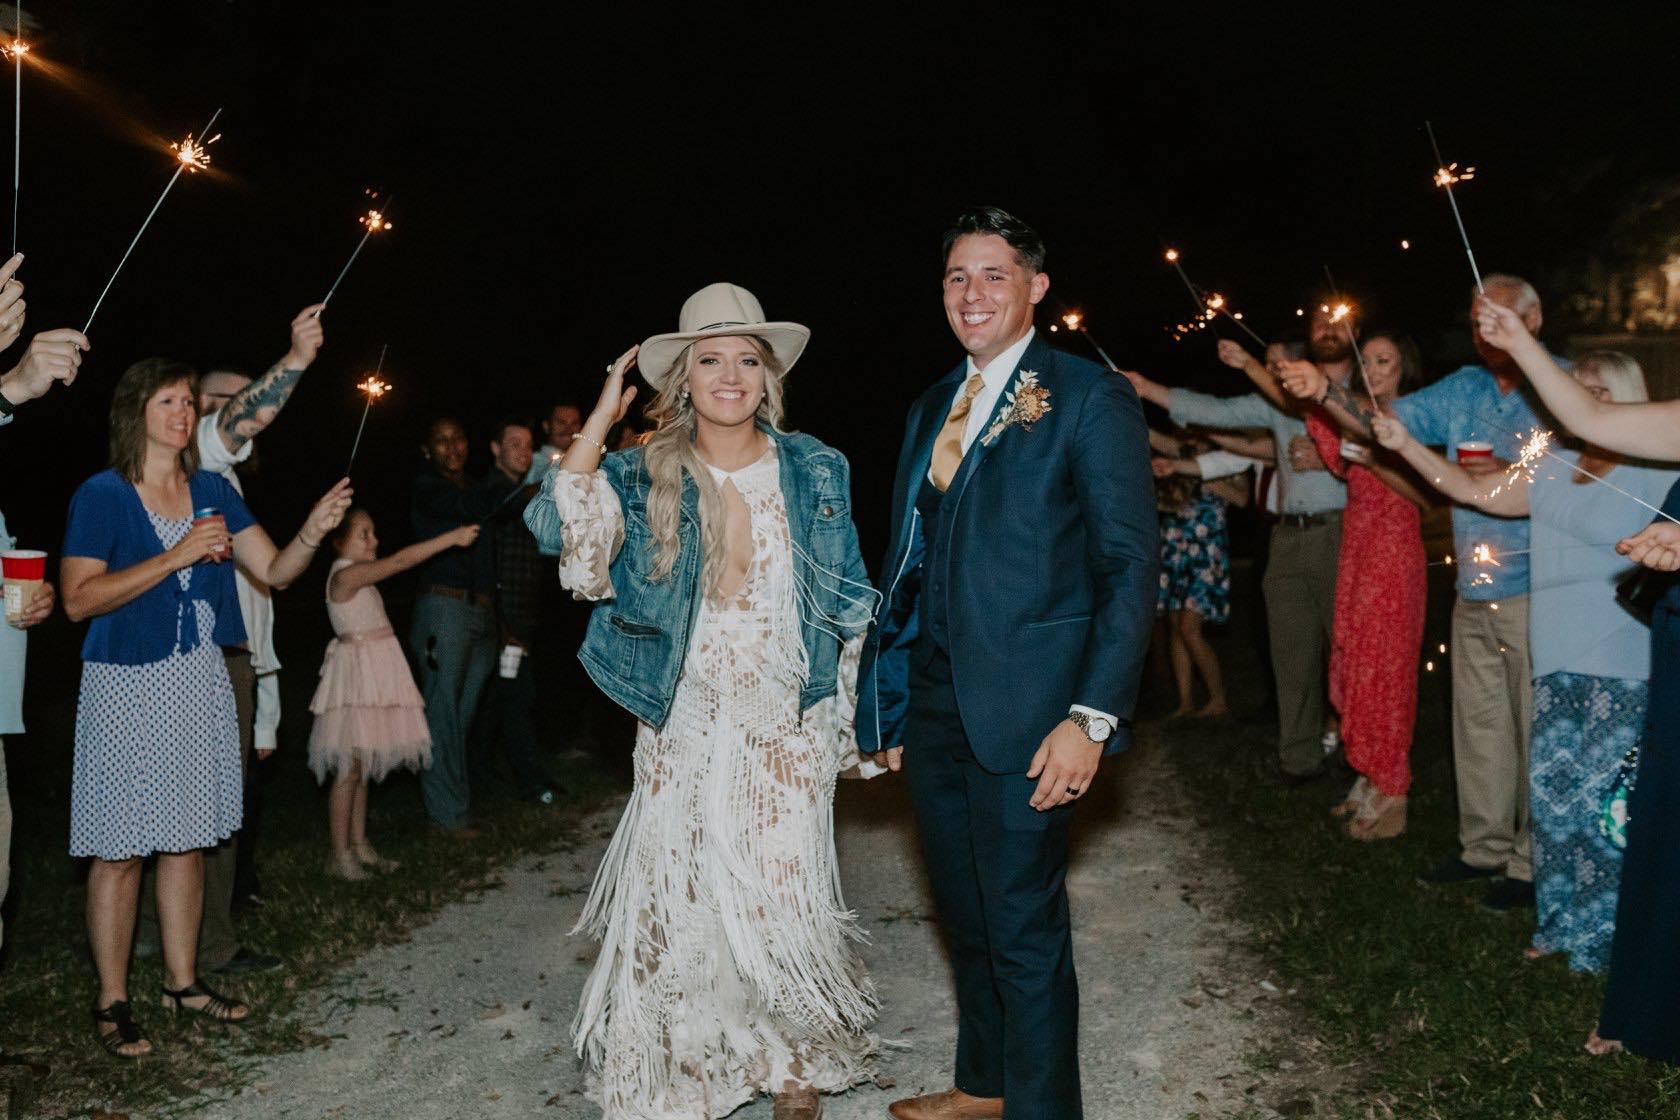 Meet Nashville Dream Events | Nashville Bride Guide